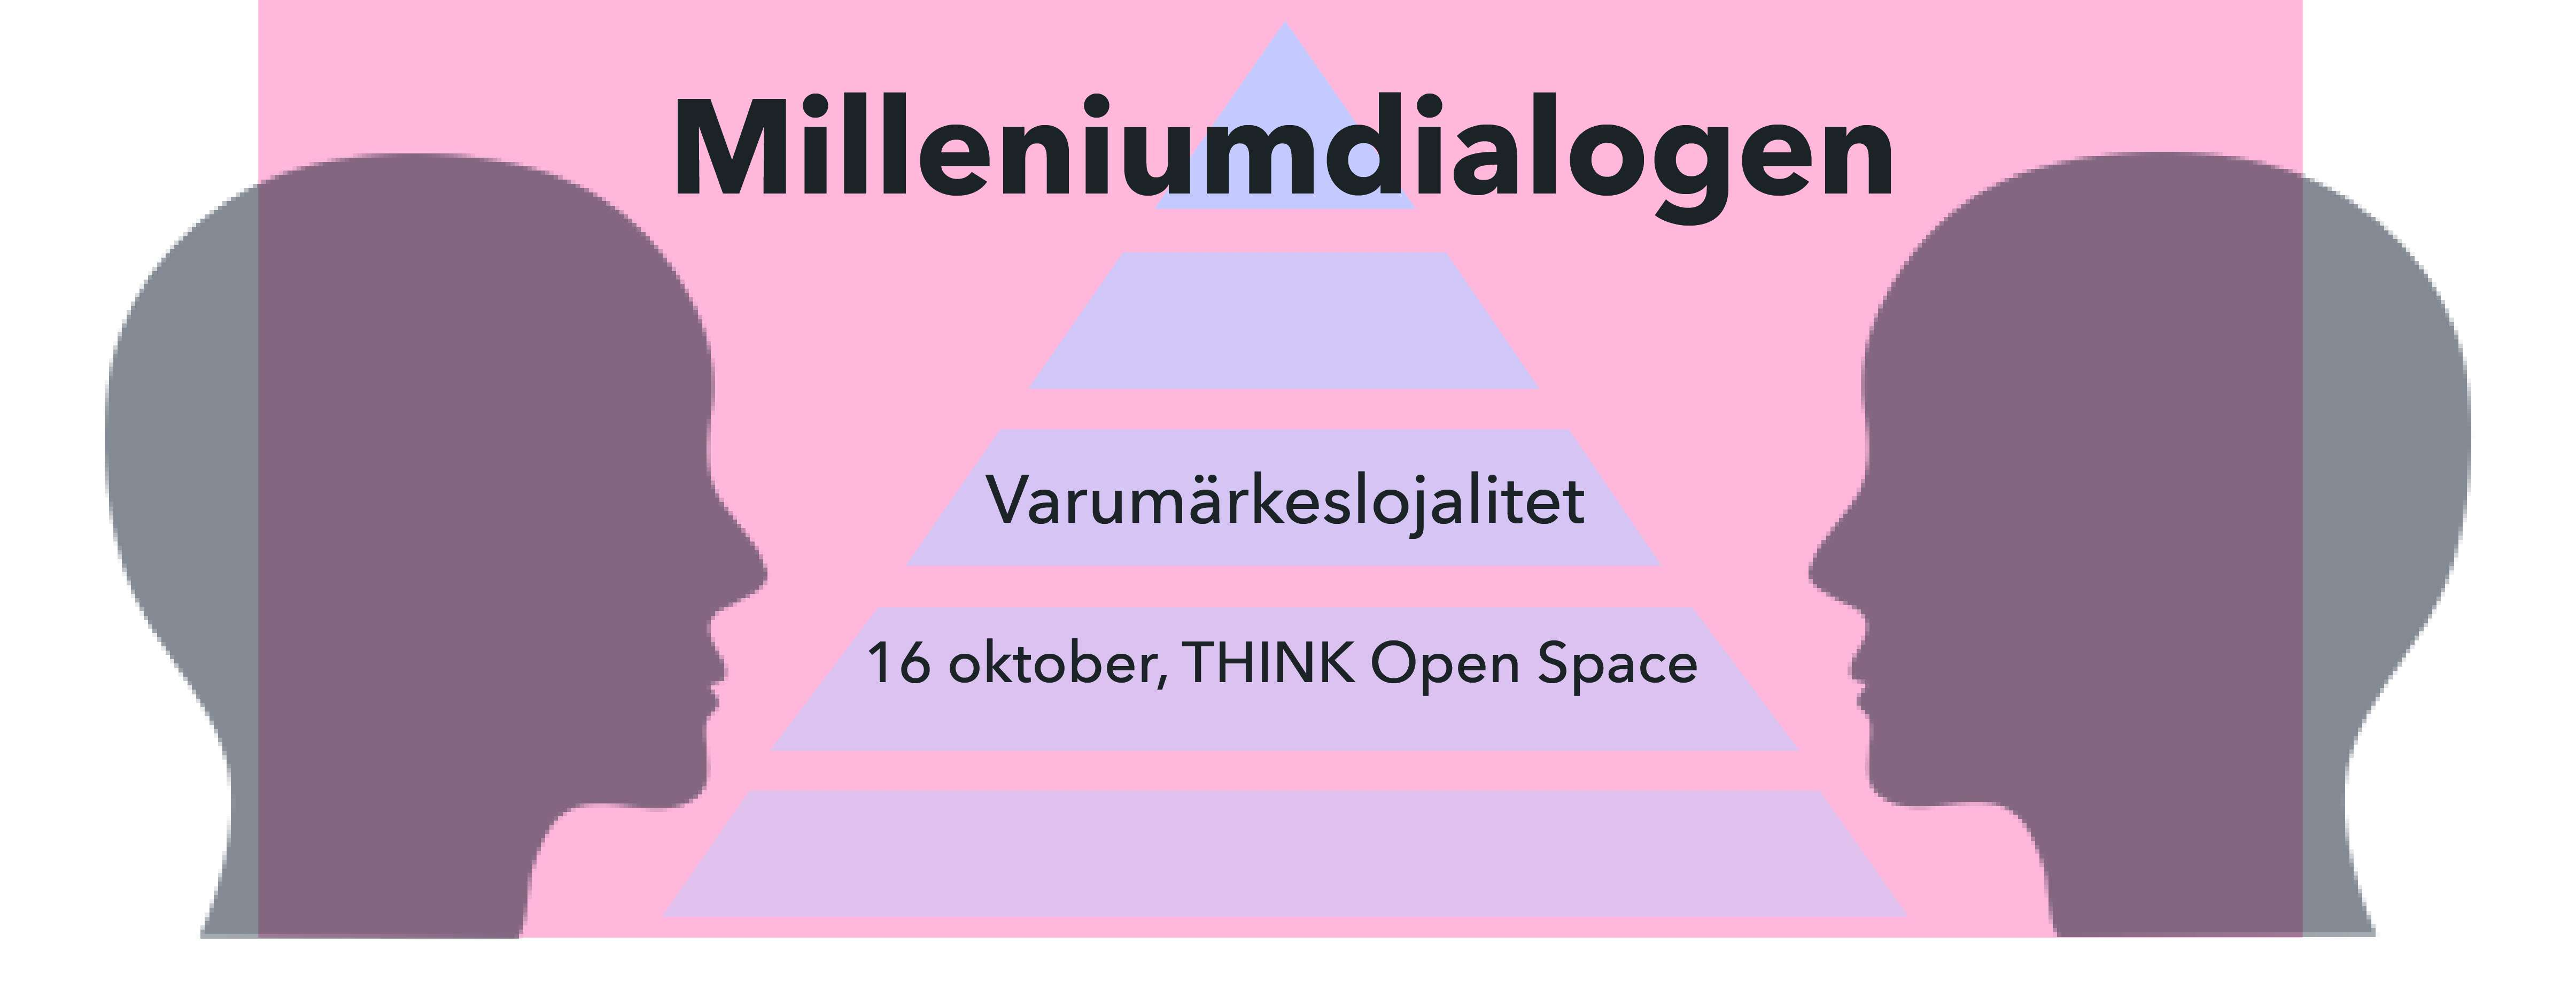 Varumärkeslojalitet – Milleniumdialogen 16 oktober